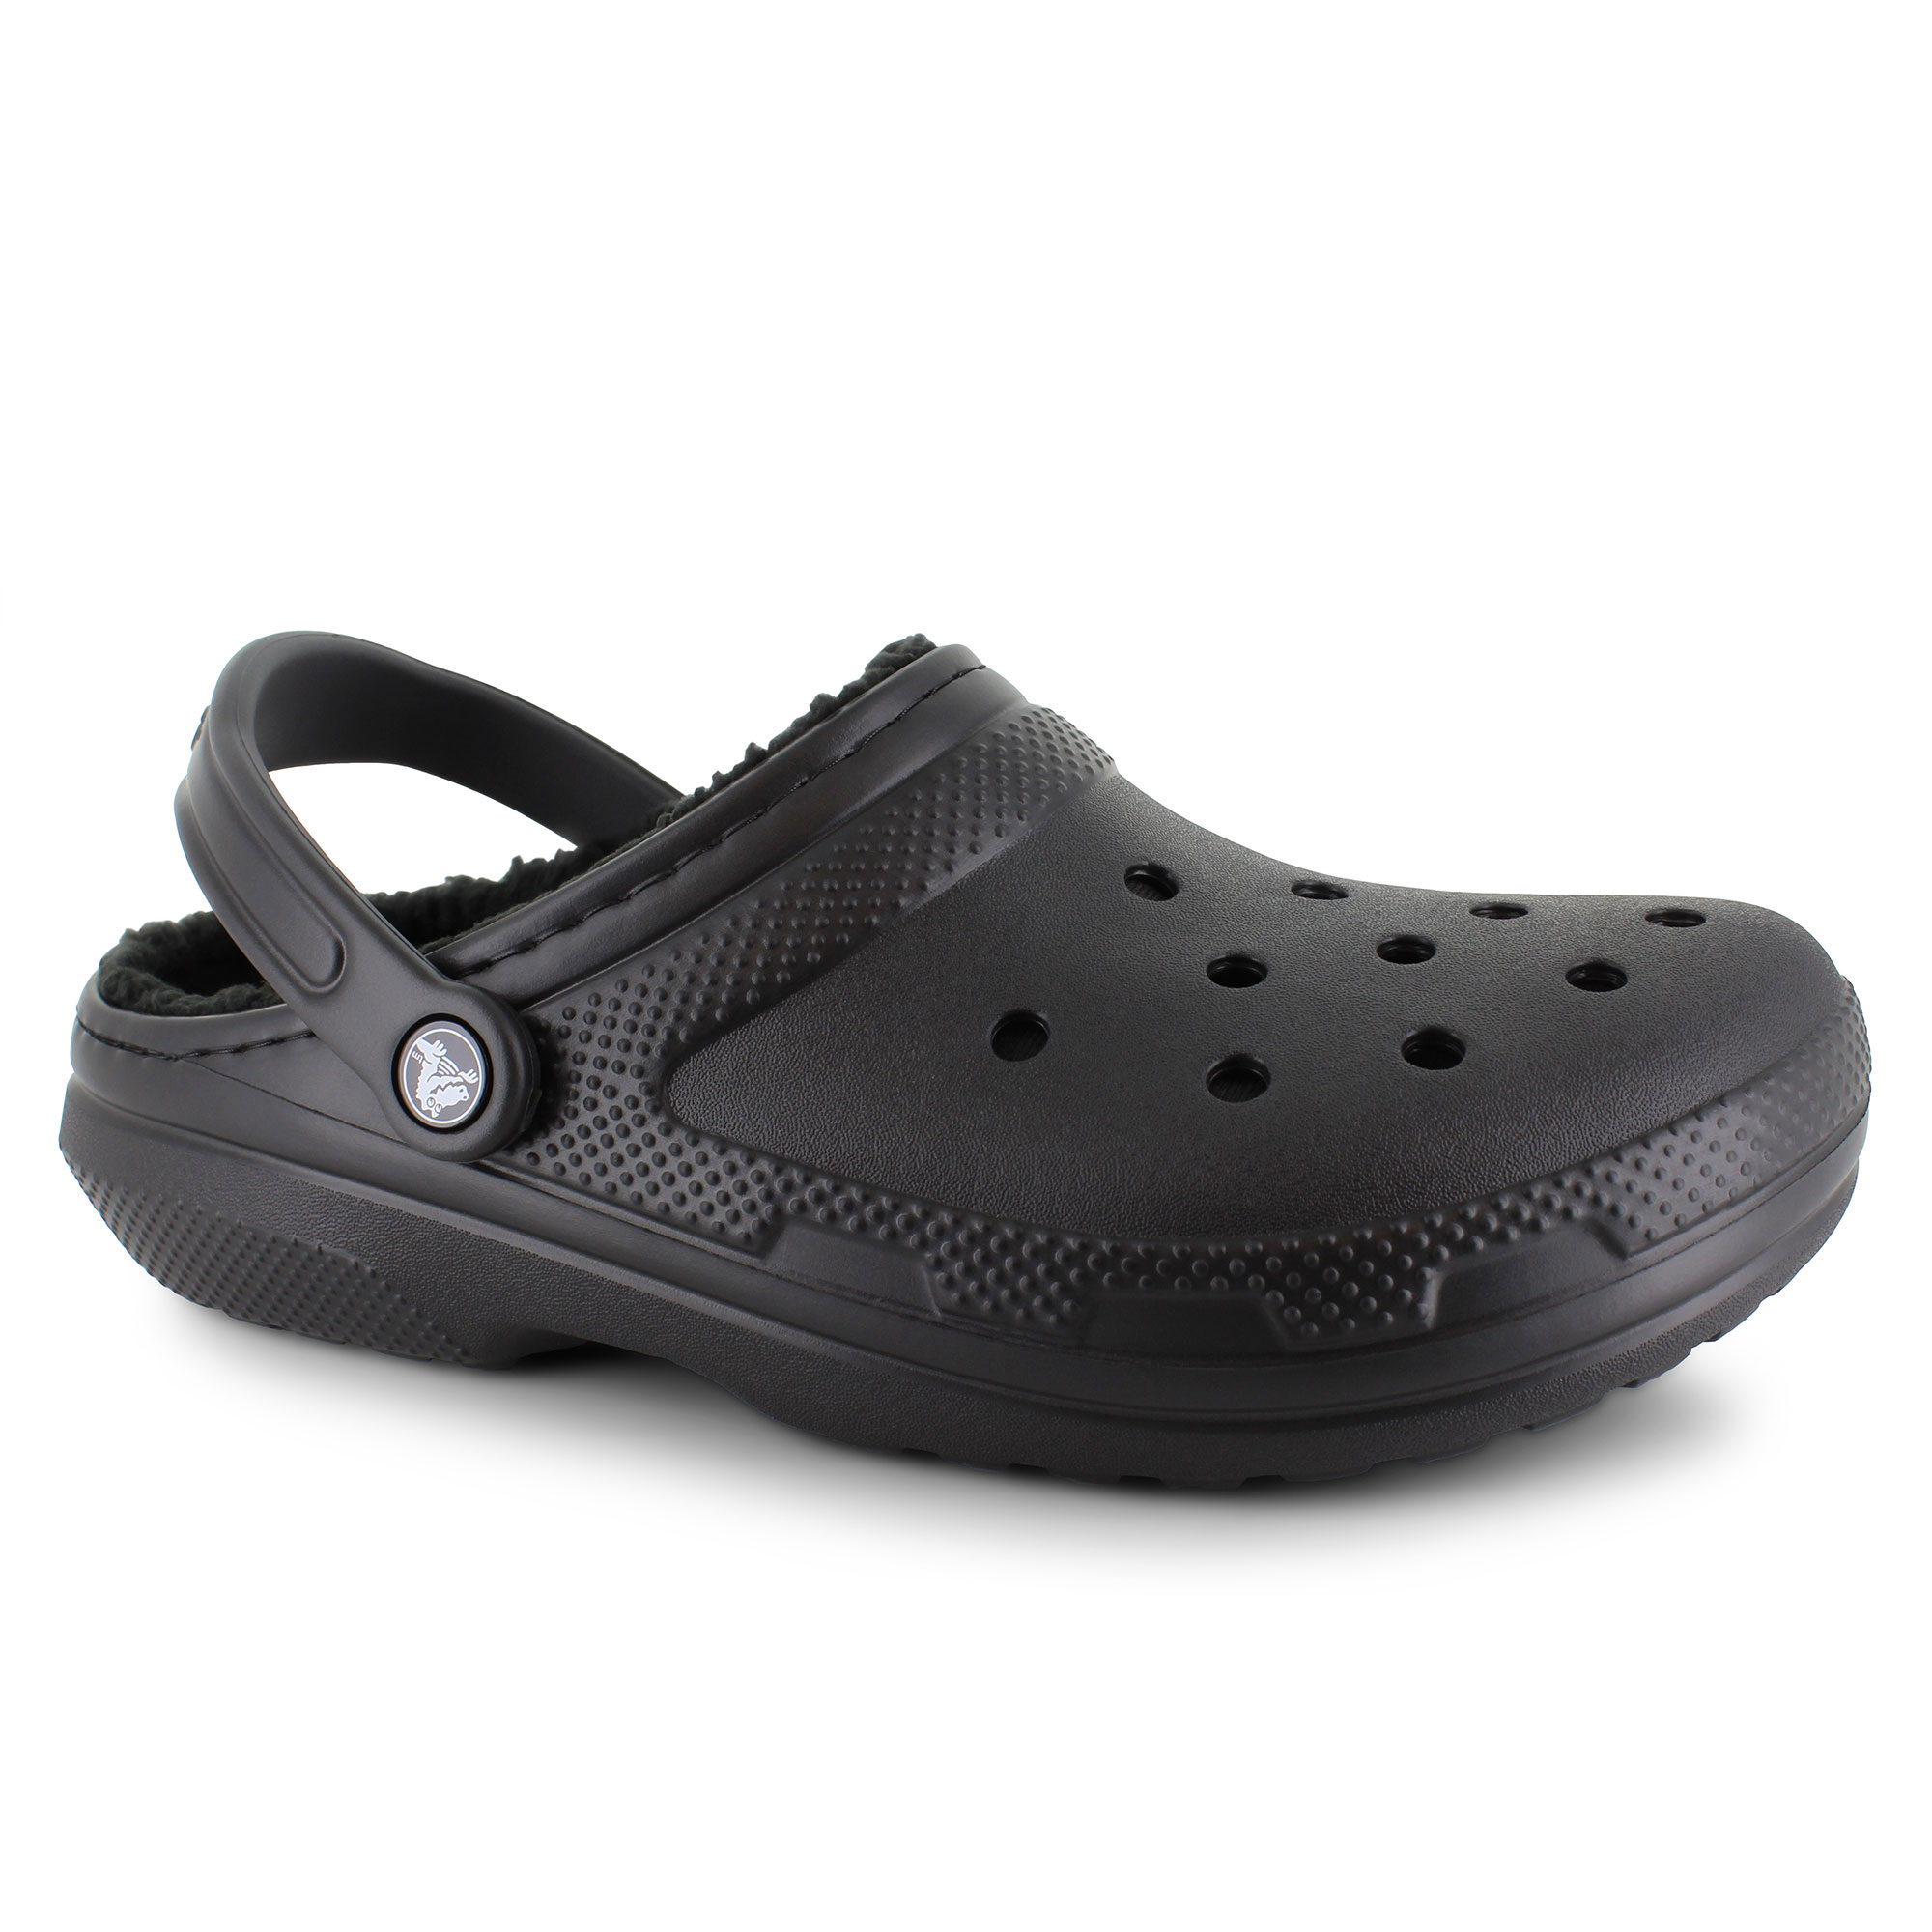 Crocs Classic Lined Clog | SHOE DEPT ENCORE